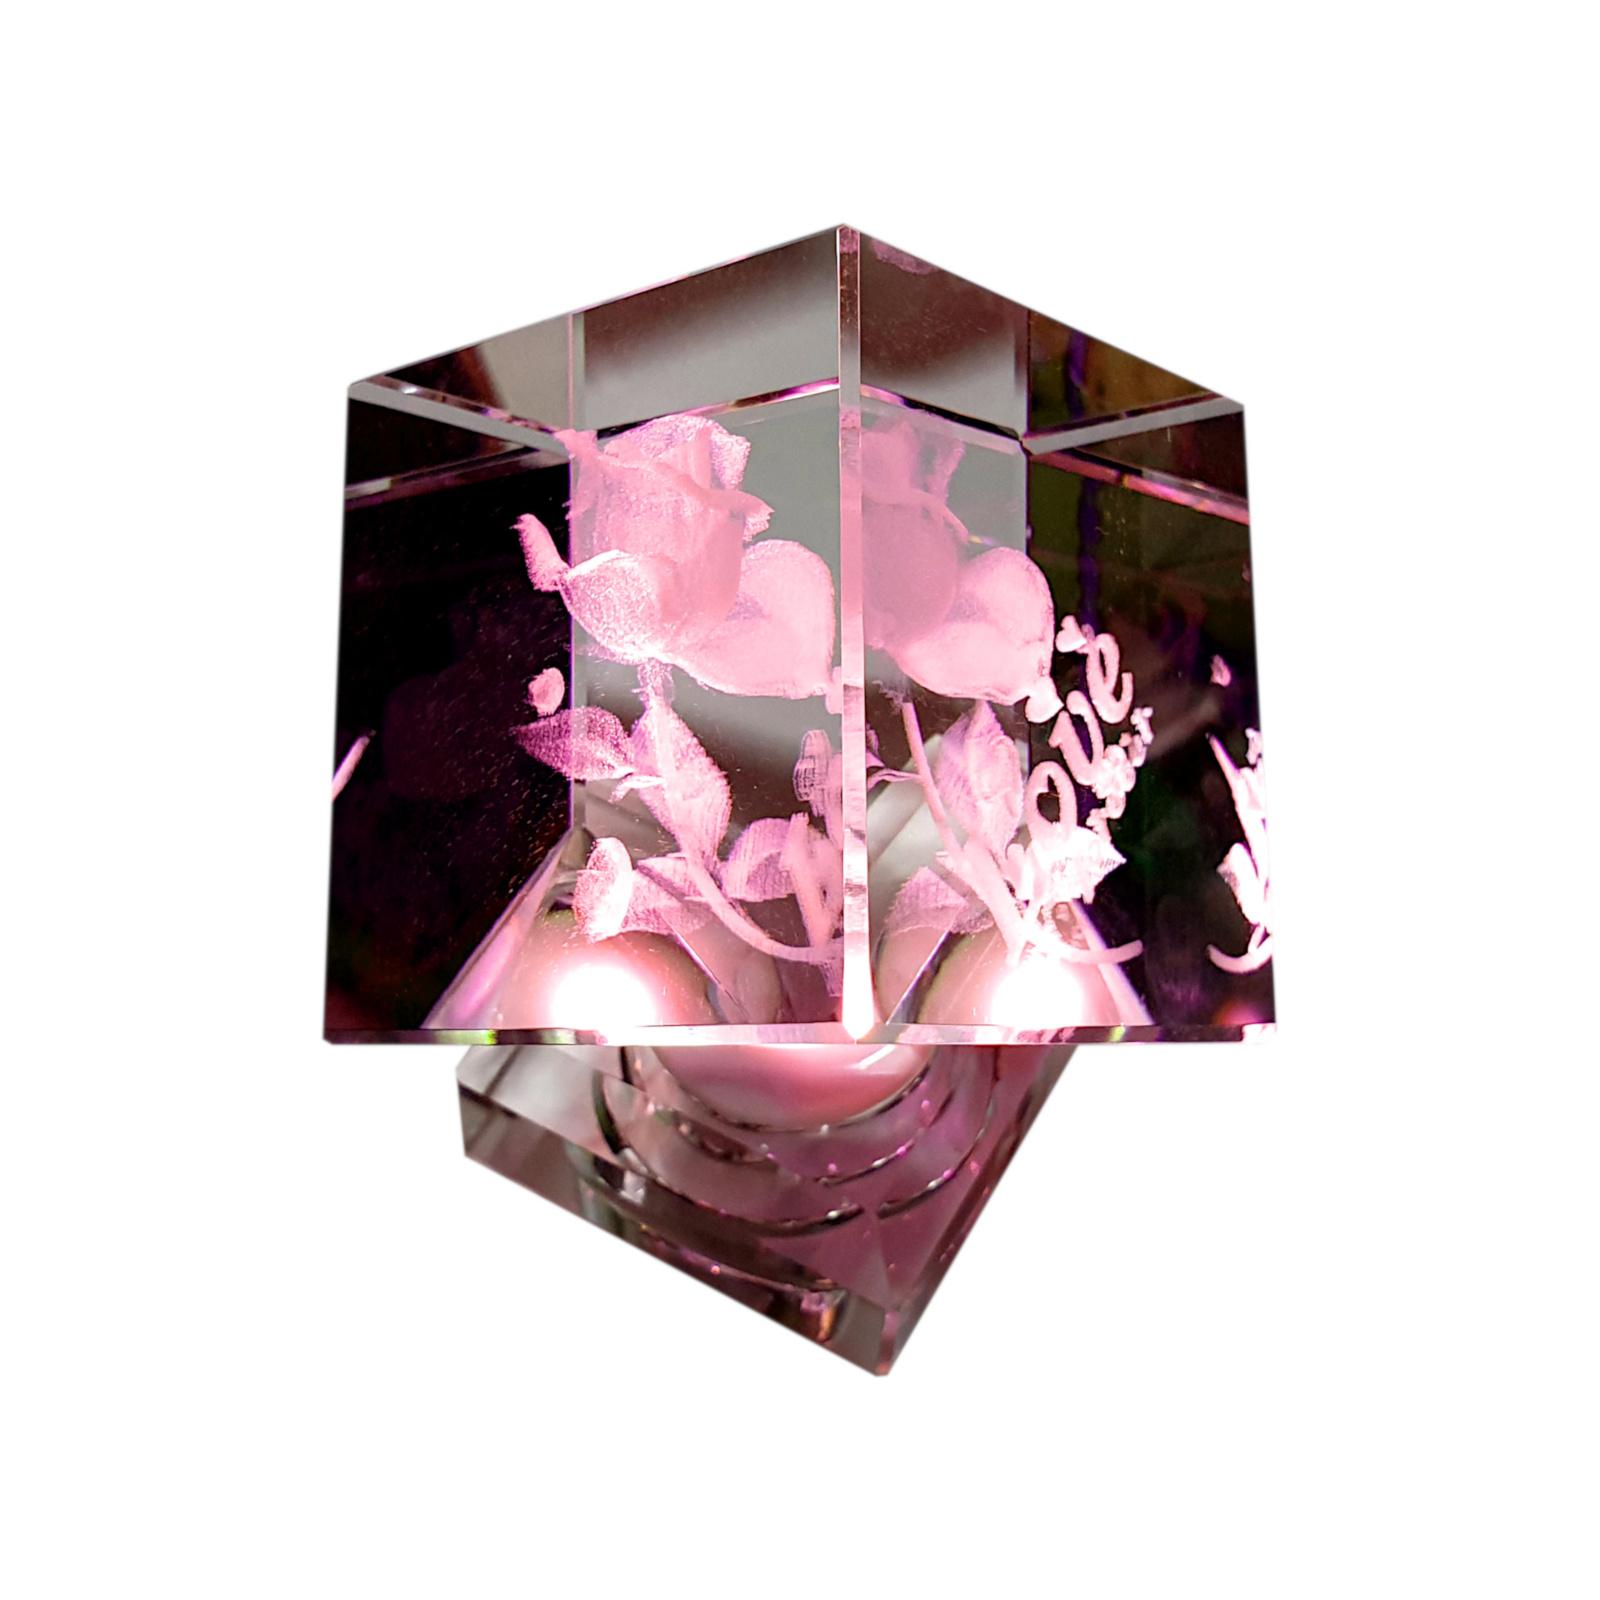 Kristallfigur Liebe Love Rose Glaskristall 3D personalisiert Partner Geschenk